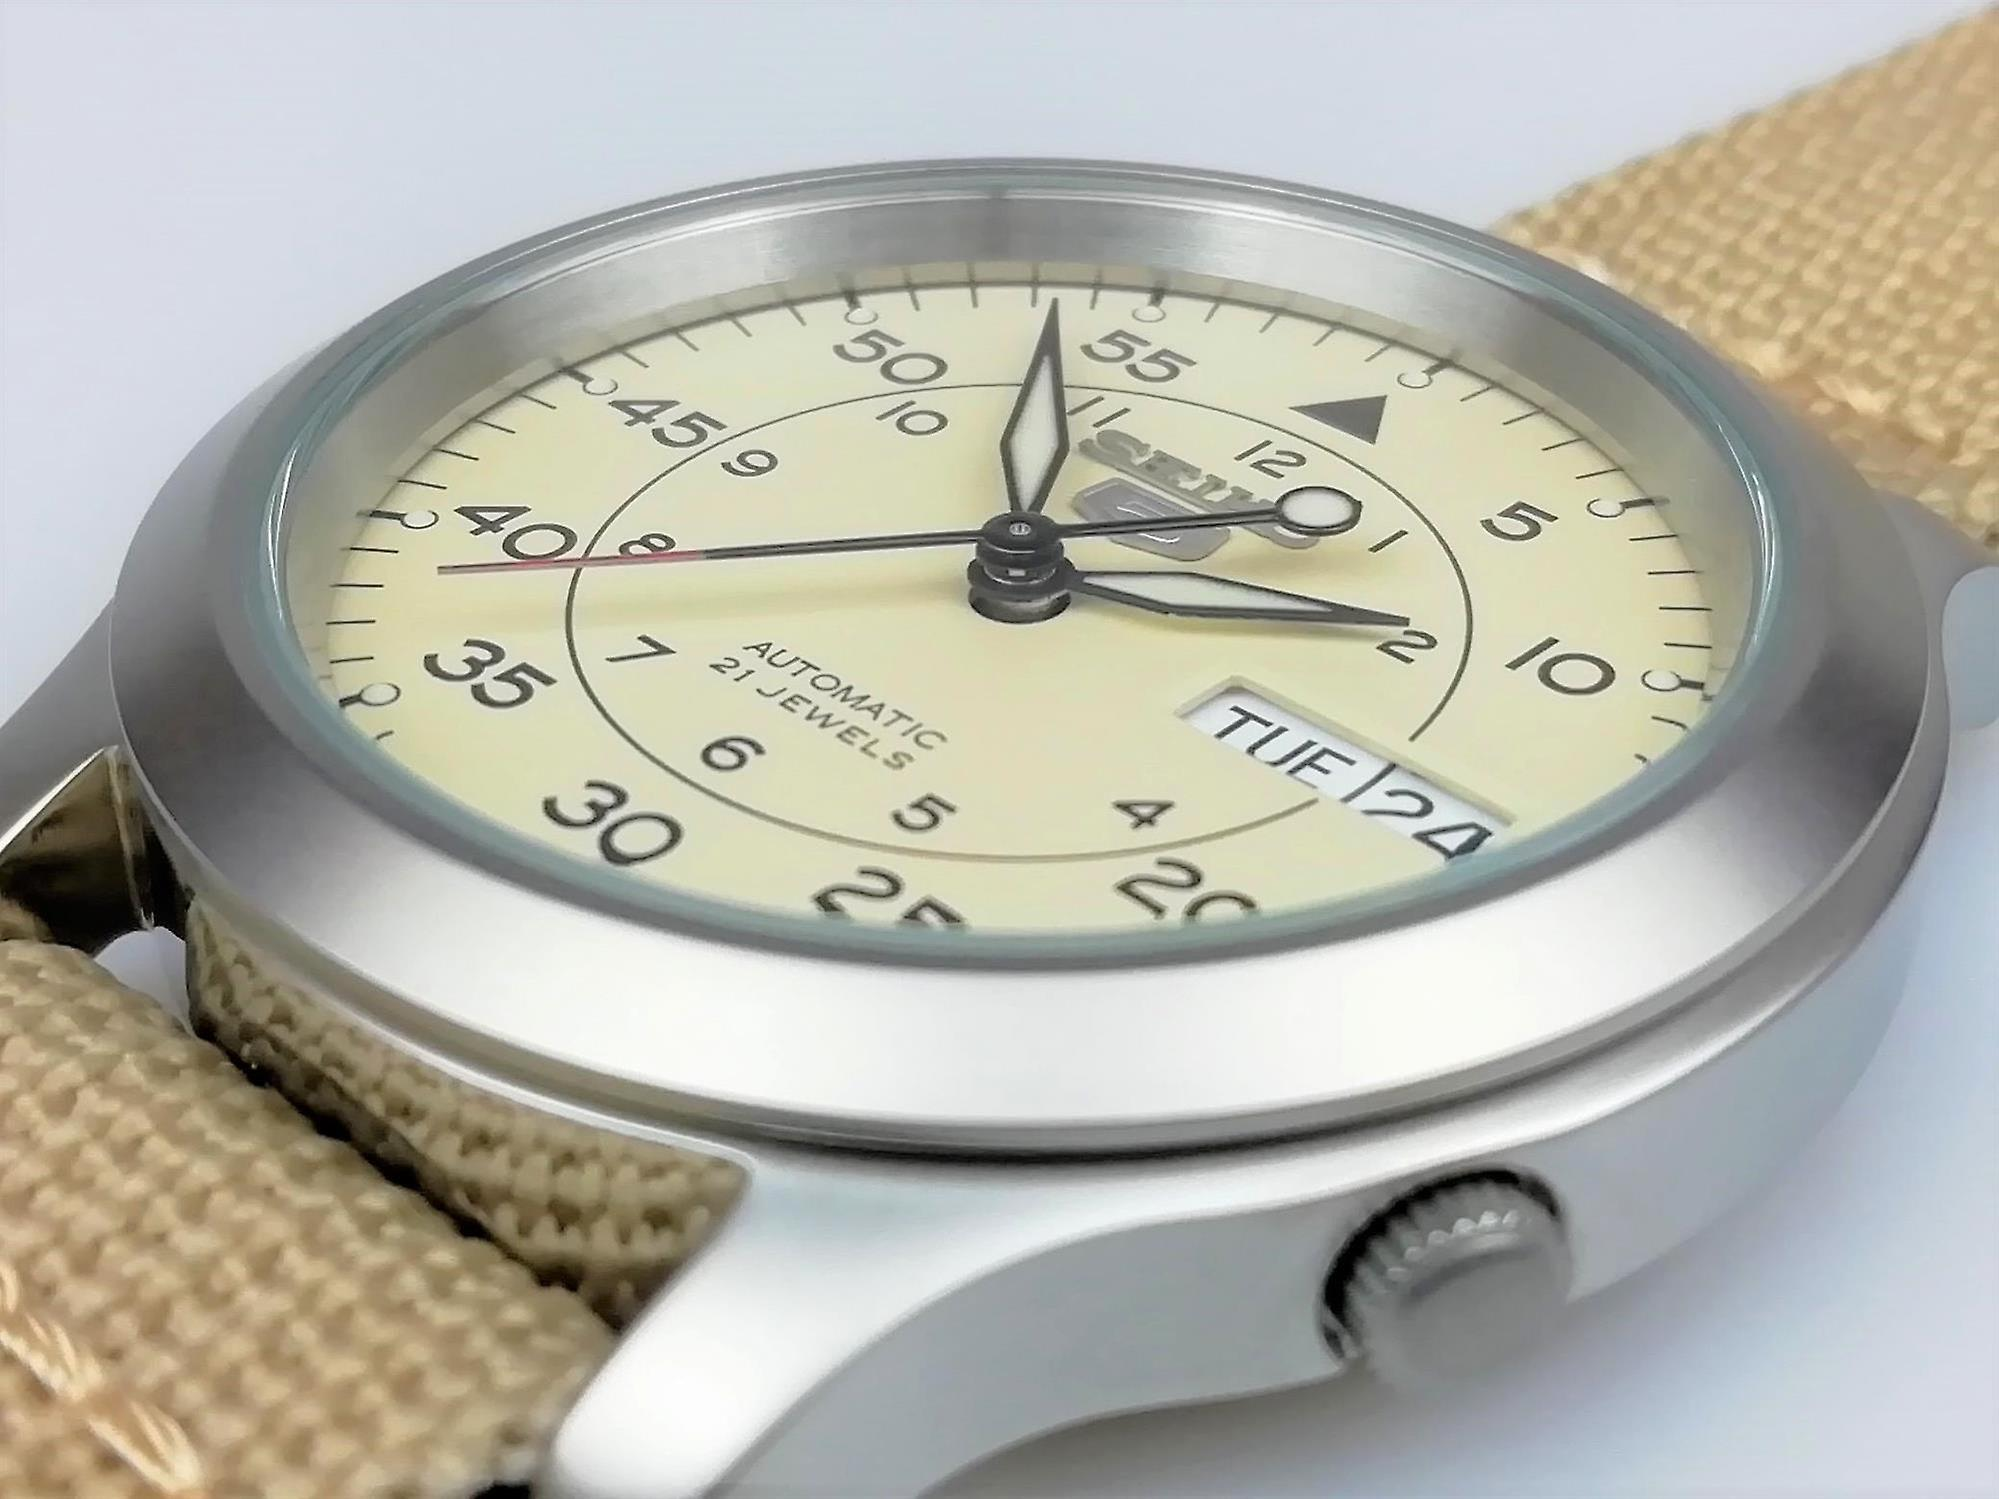 Seiko 5 Automatic Beige NATO Military Style Strap Men's Watch SNK803K2 RRP £169